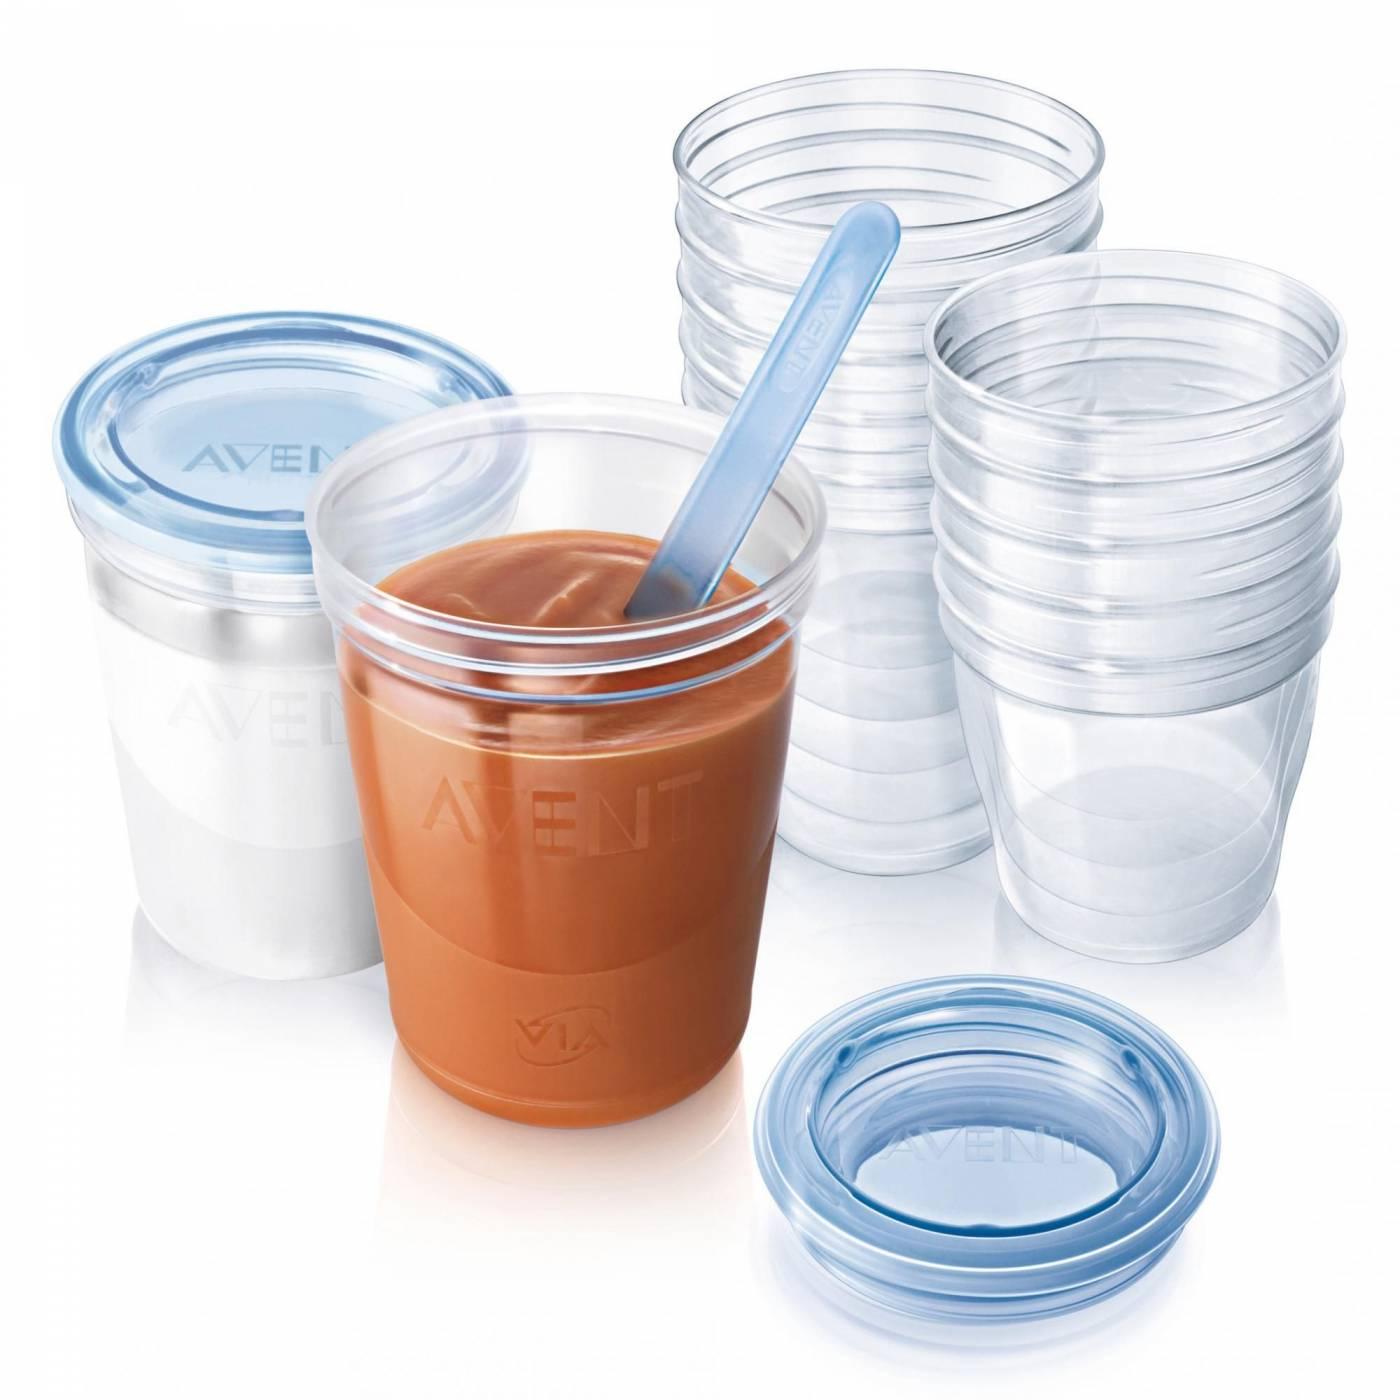 Recipiente para Alimentos e Leite Materno - Philips Avent